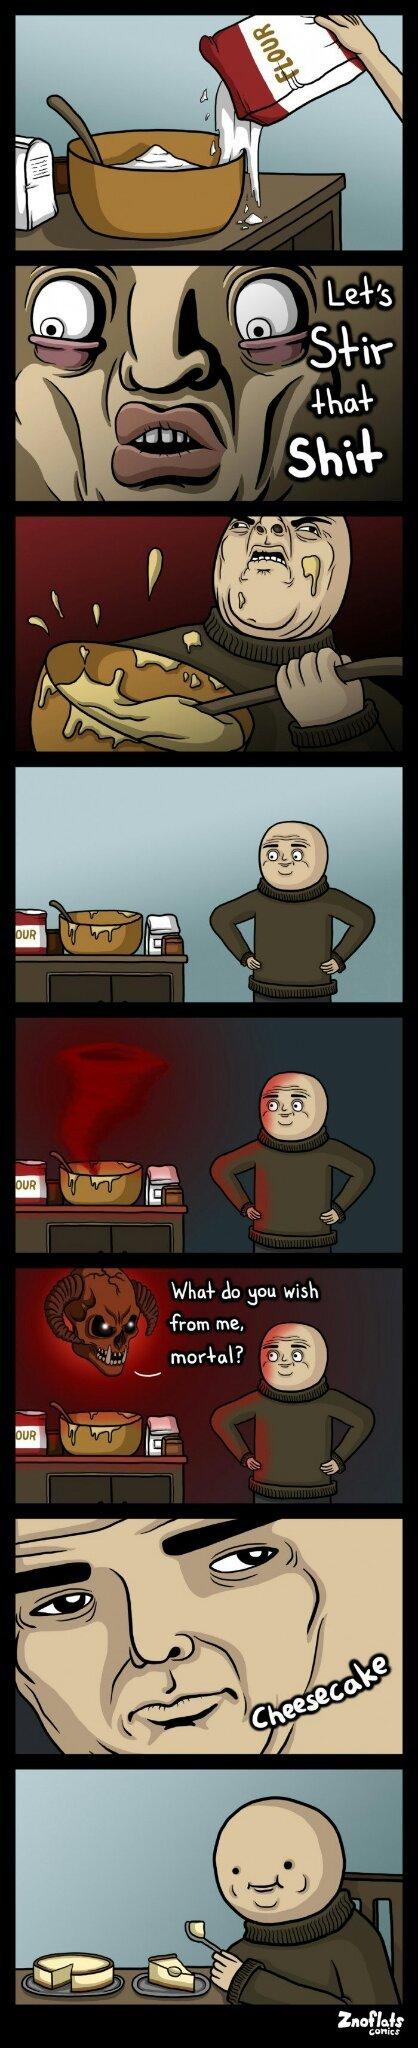 Cheesecake - meme